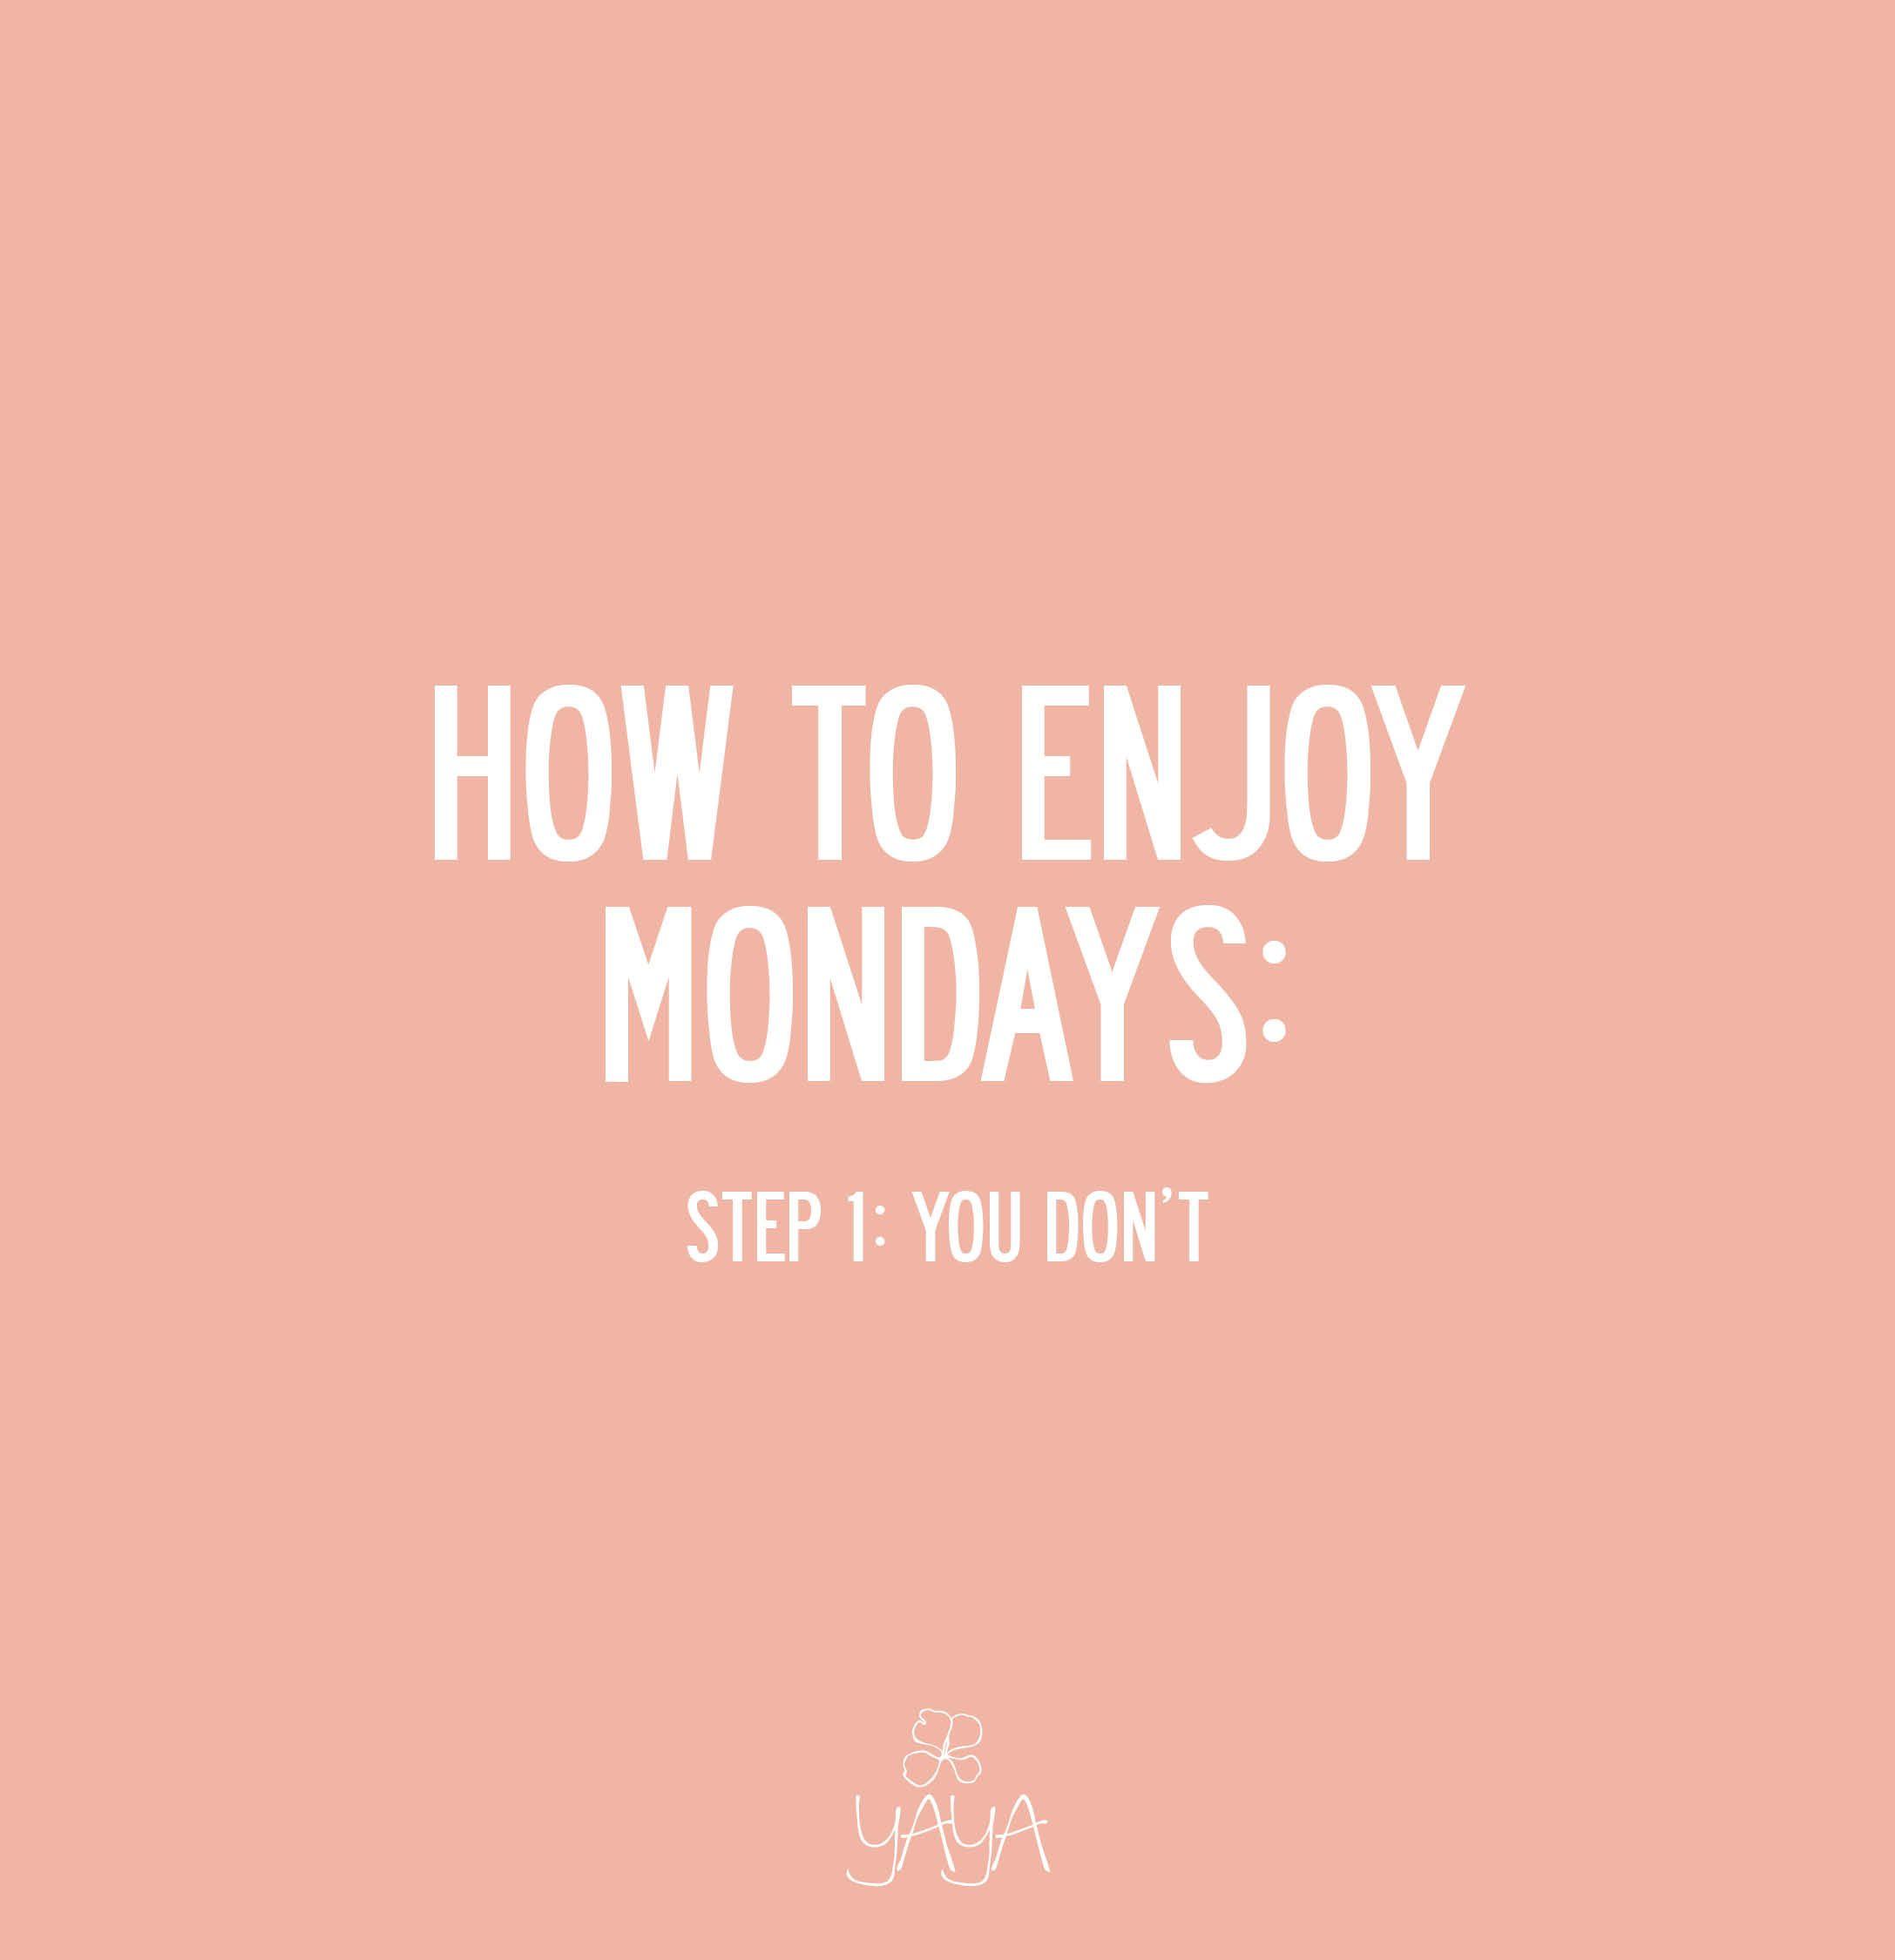 Enjoy Mondays Monday Quotes Weekend Quotes Monday Motivation Quotes